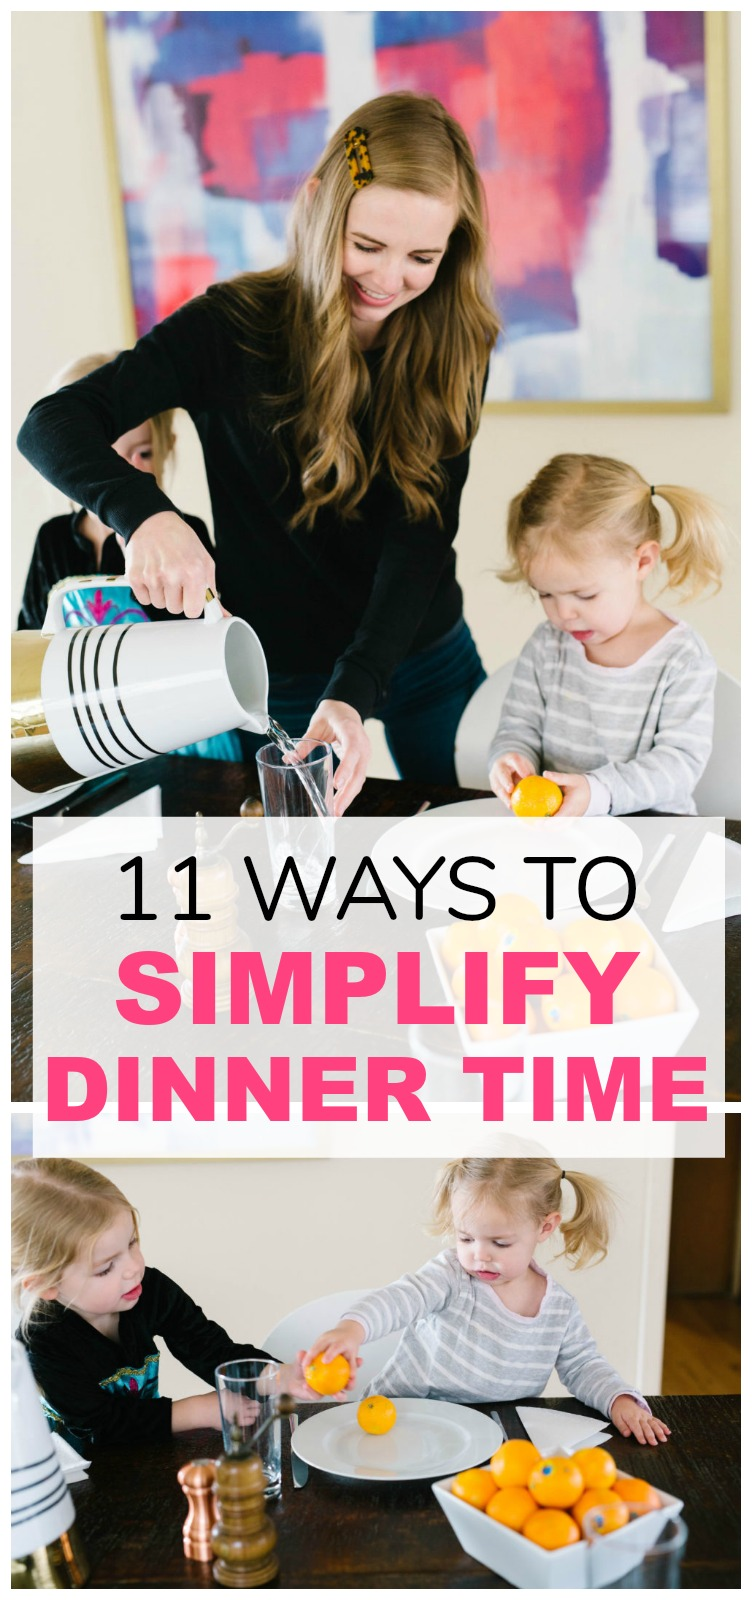 Simplify Dinner time